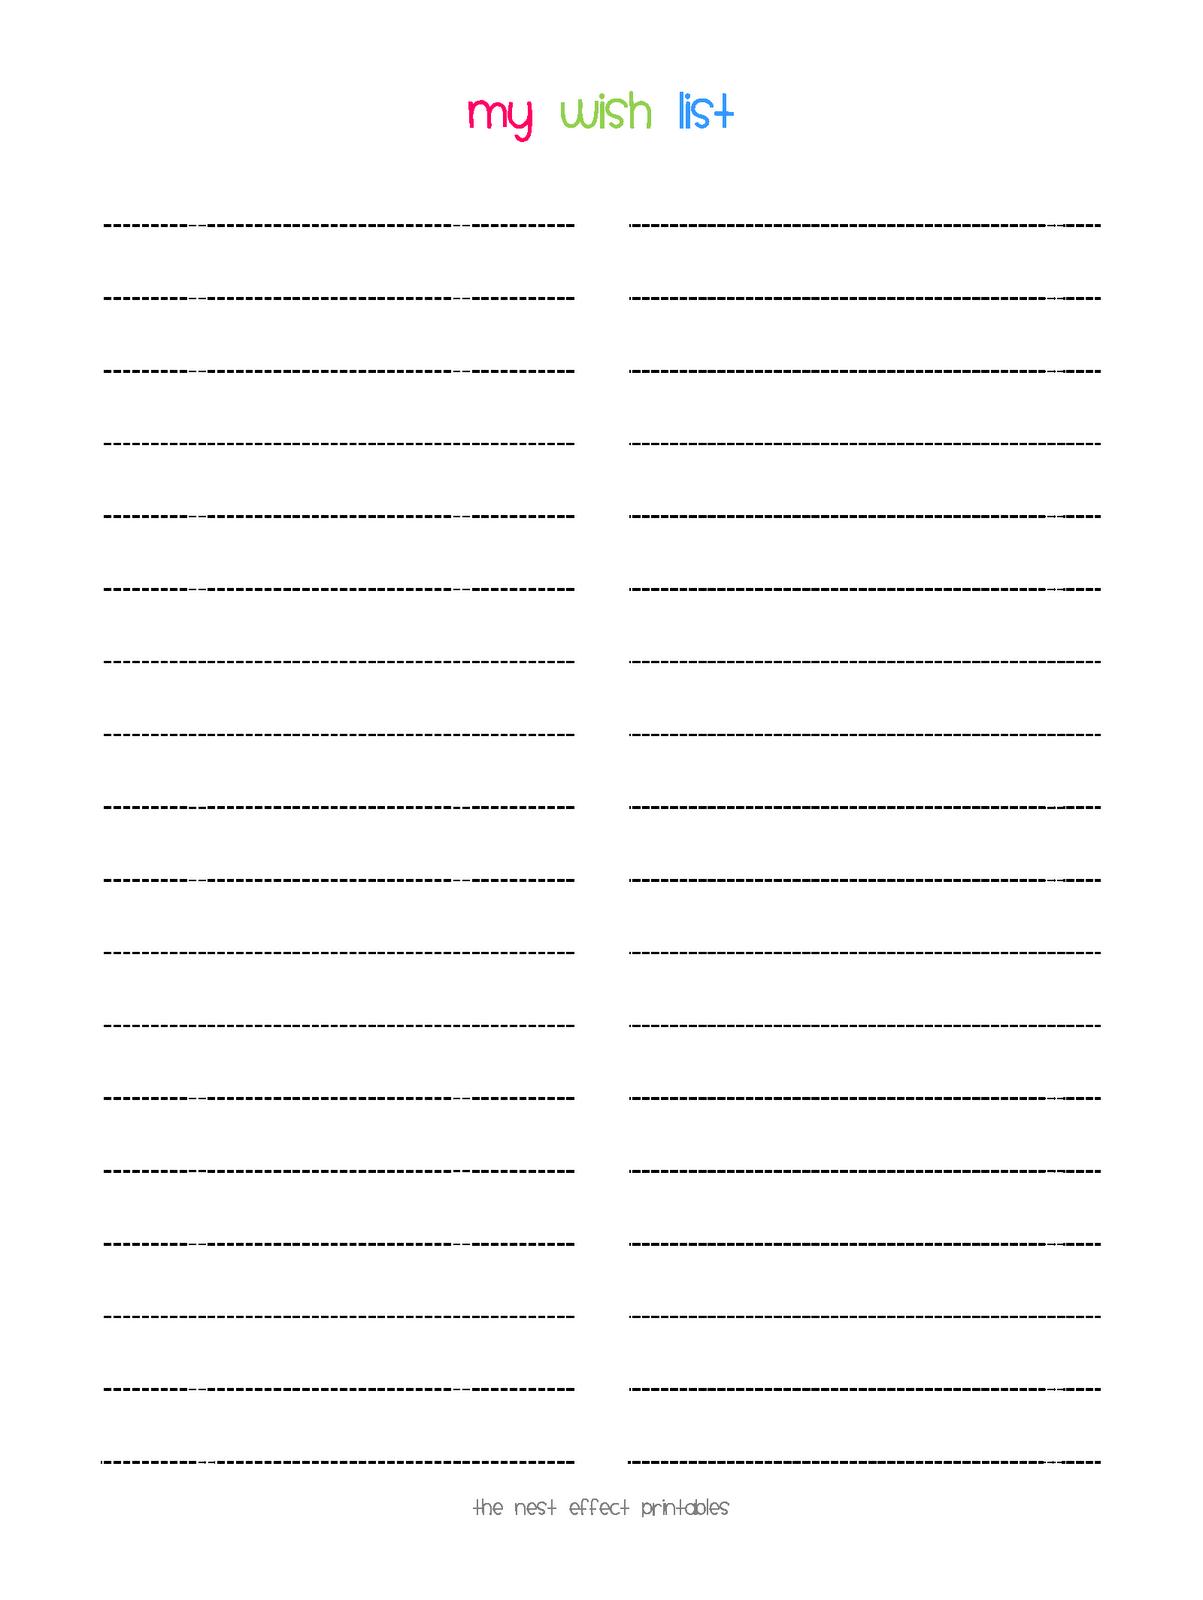 christmas wish list template 8 free templates in pdf word blank – Xmas Wish List Template